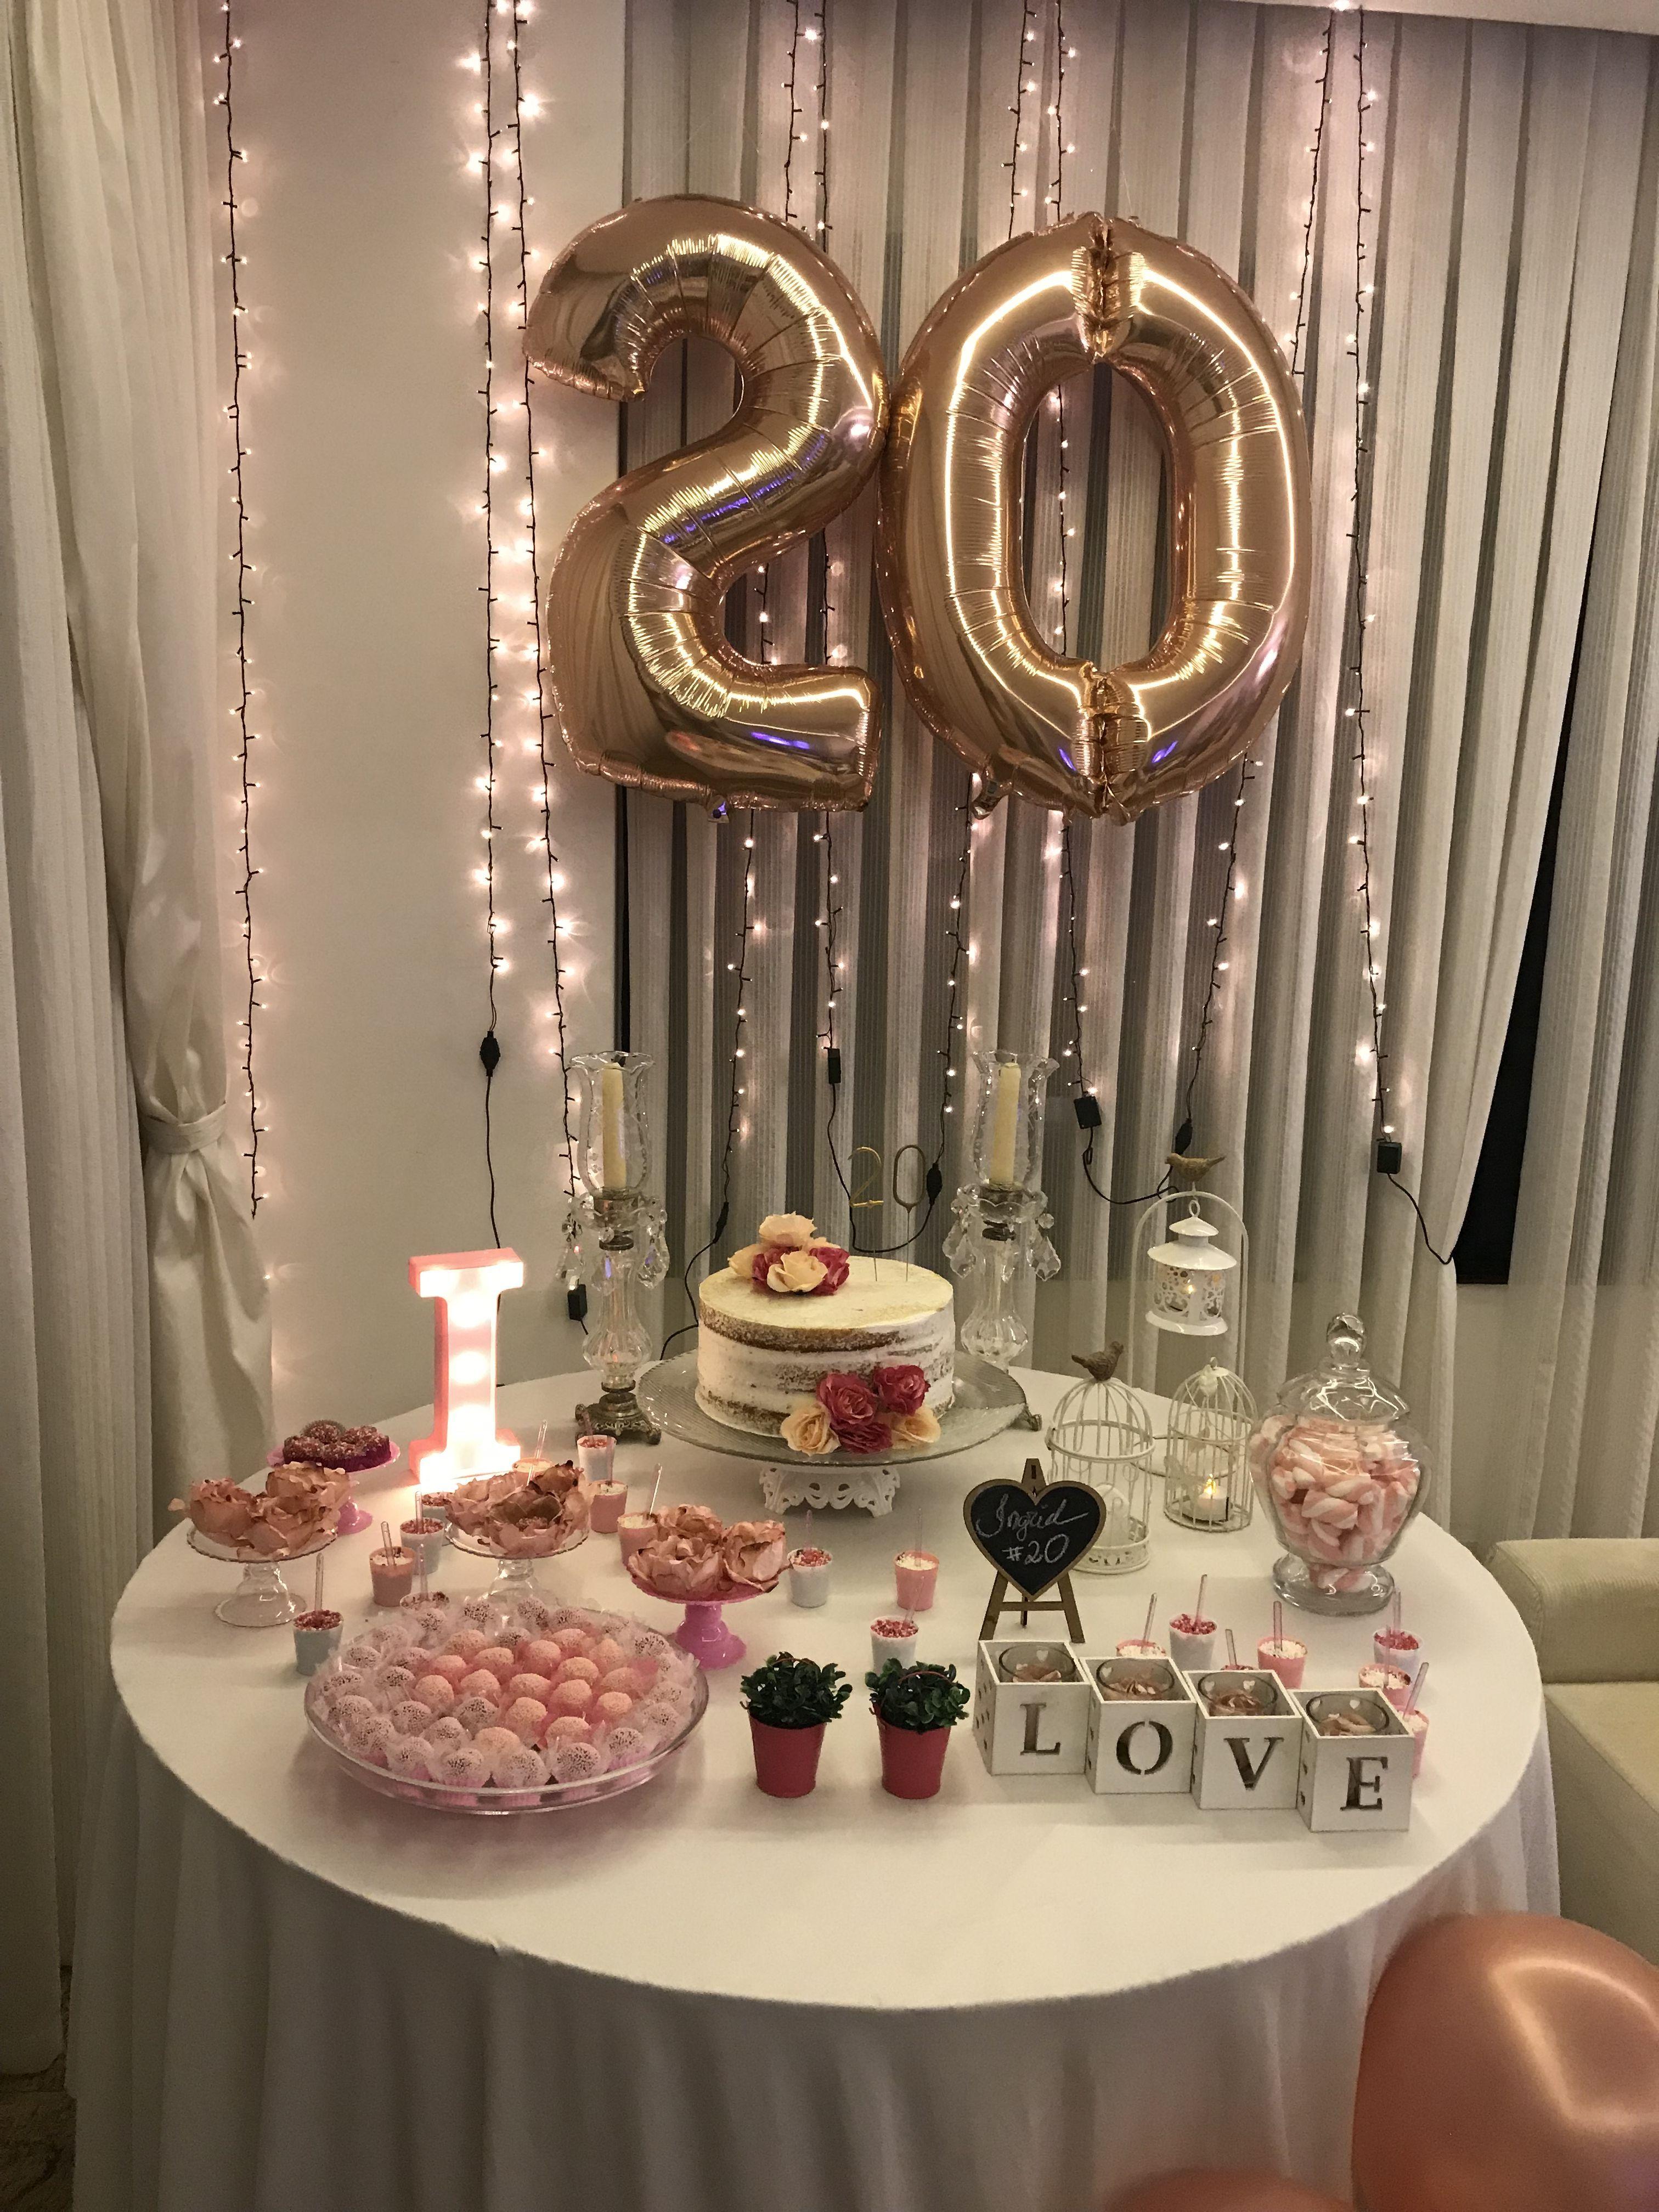 21stbirthdaydecorations 21st Birthday Decorations Birthday Party Decorations For Adults Birthday Party Decorations